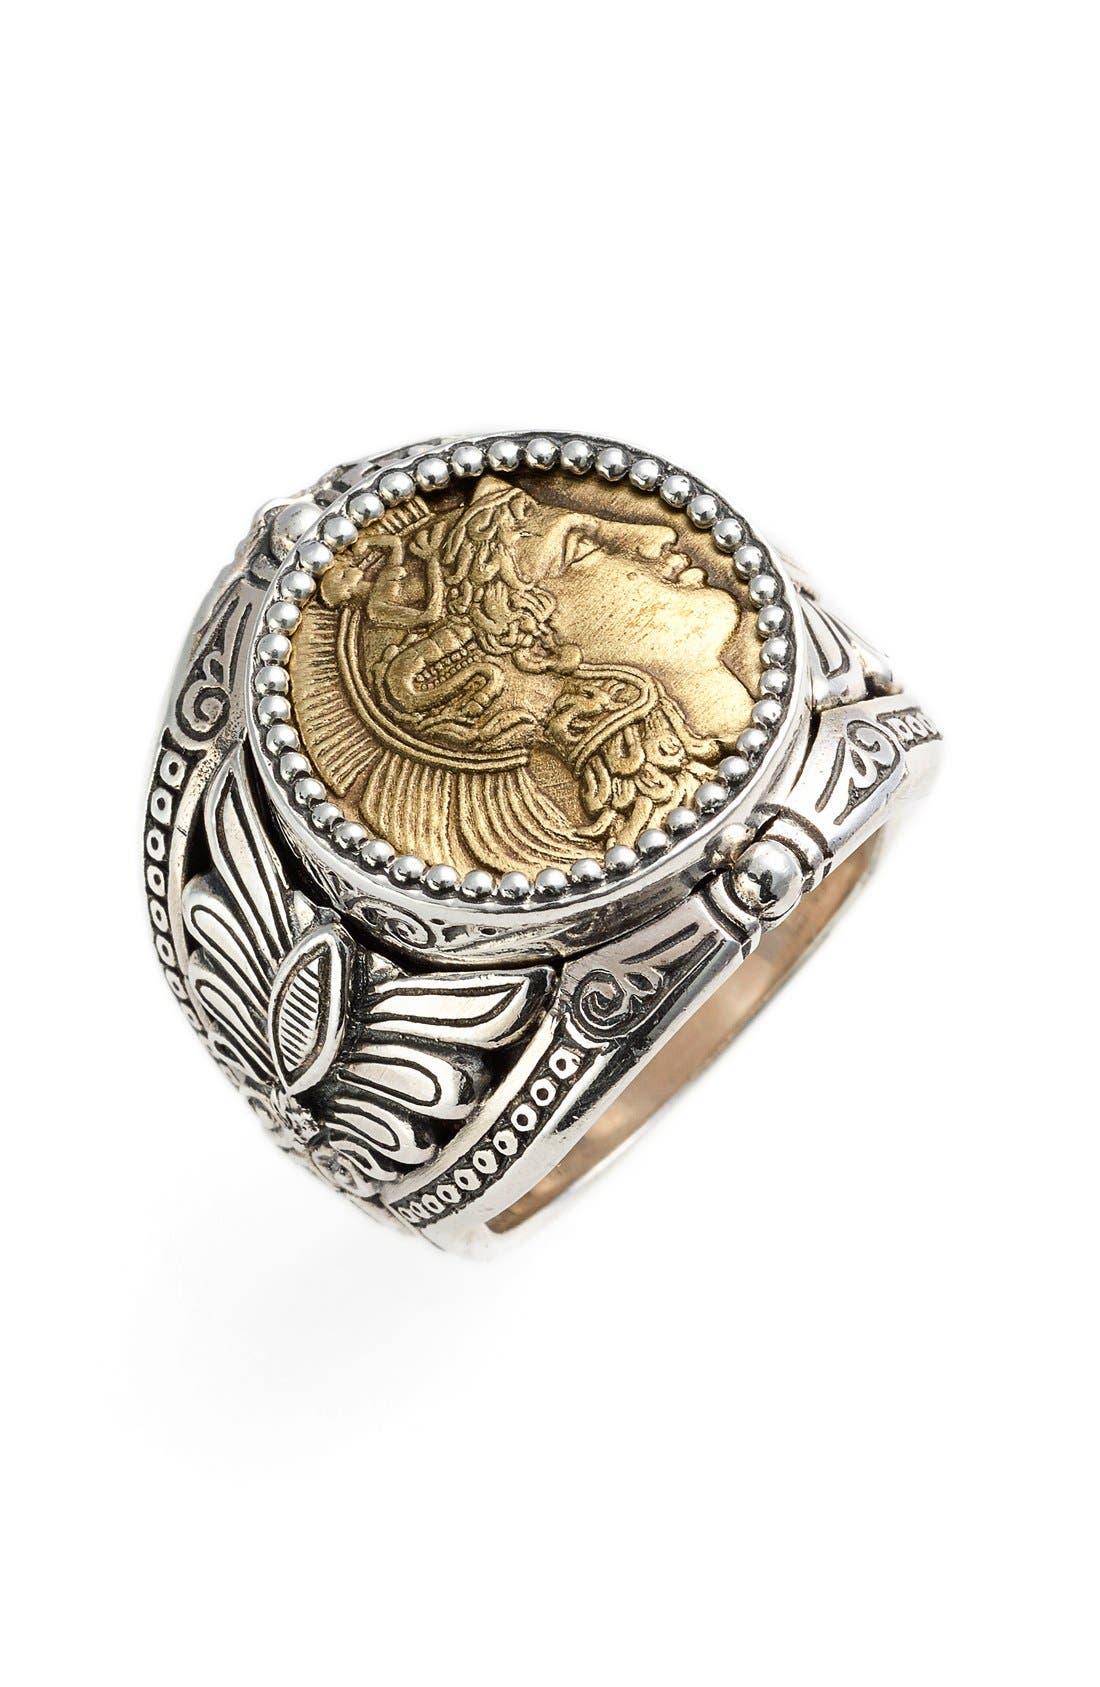 KONSTANTINO Athena Coin Ring